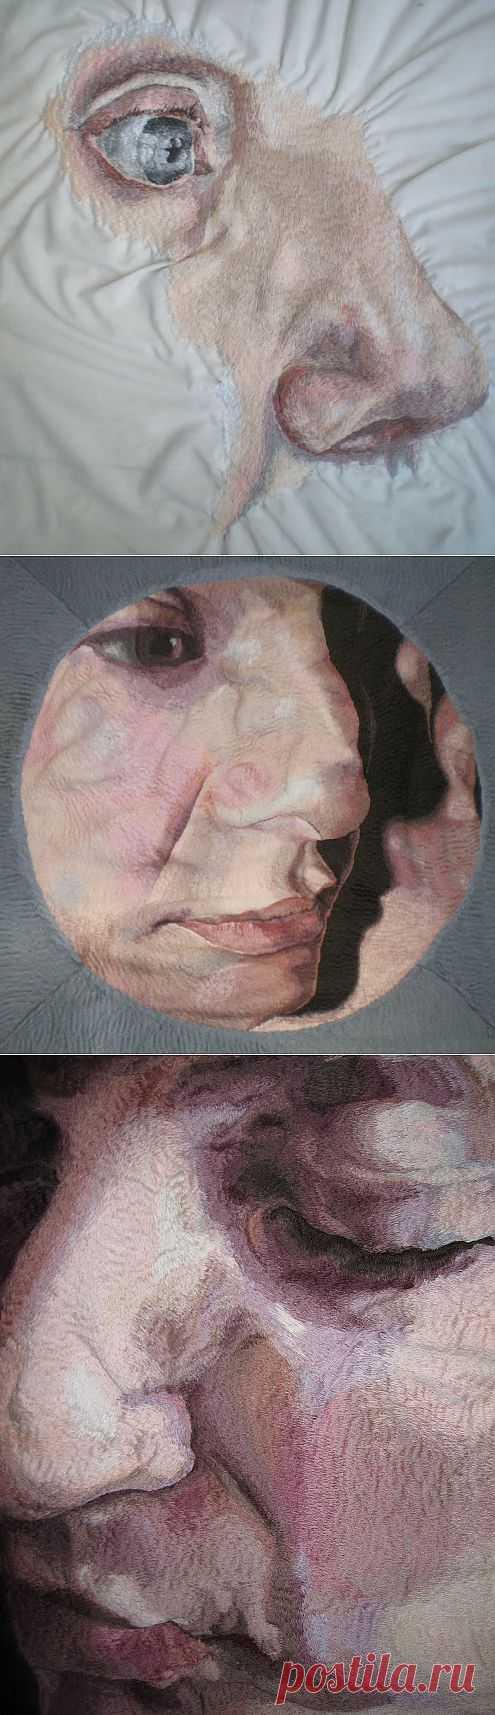 Вышитые портреты Harriet Maxwell / Вышивка / ВТОРАЯ УЛИЦА